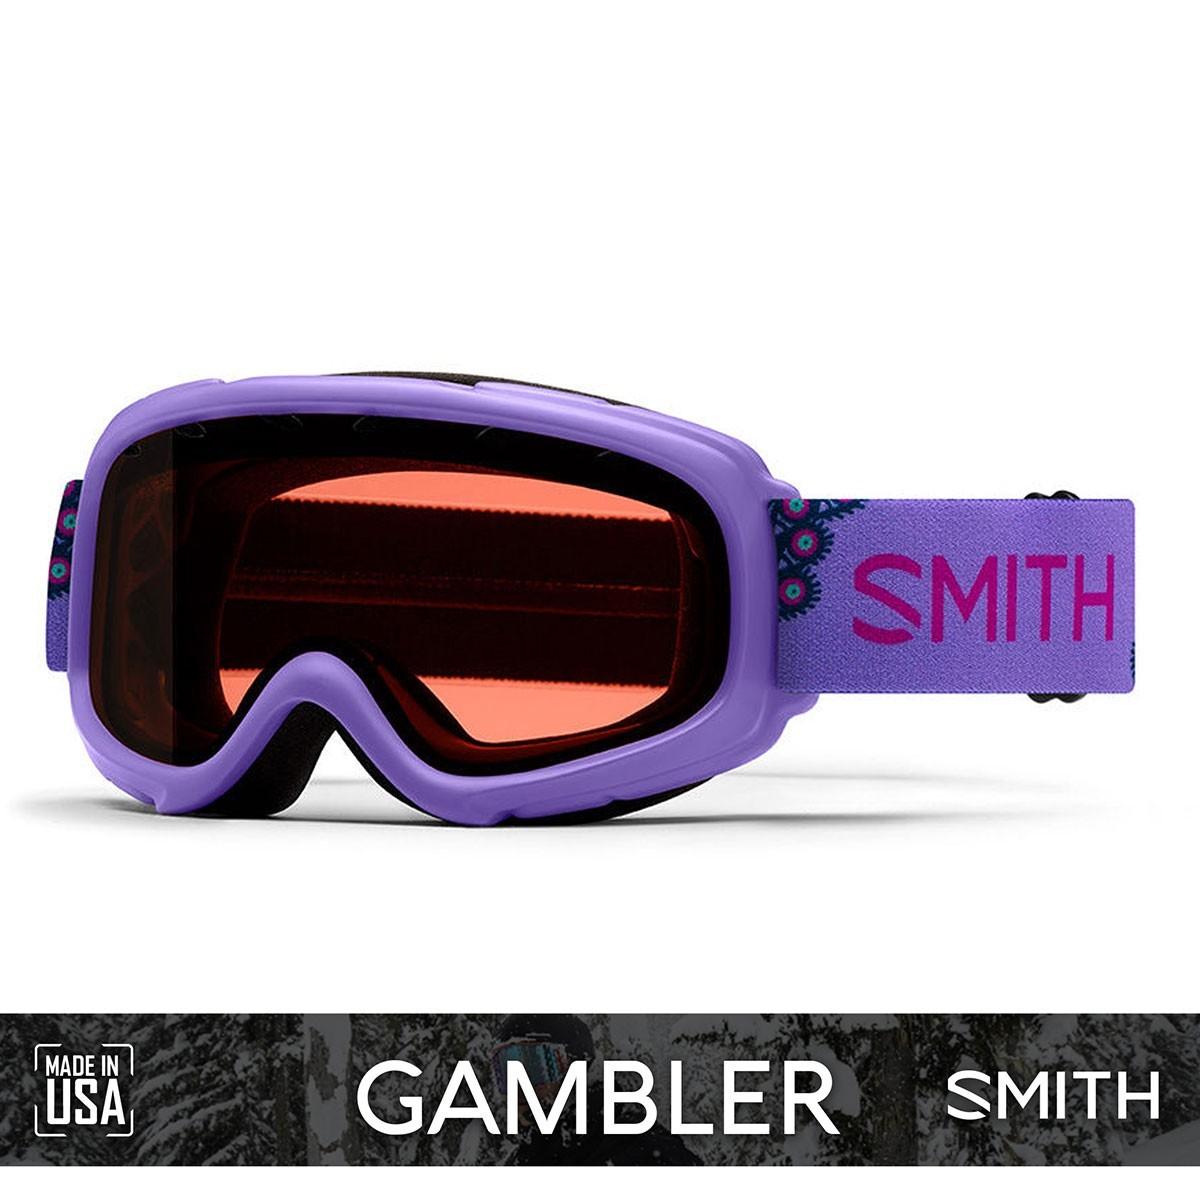 SMITH GAMBLER AIR Purple Peacocks | S2 RC36 ROSEC - Изображение - AQUAMATRIX